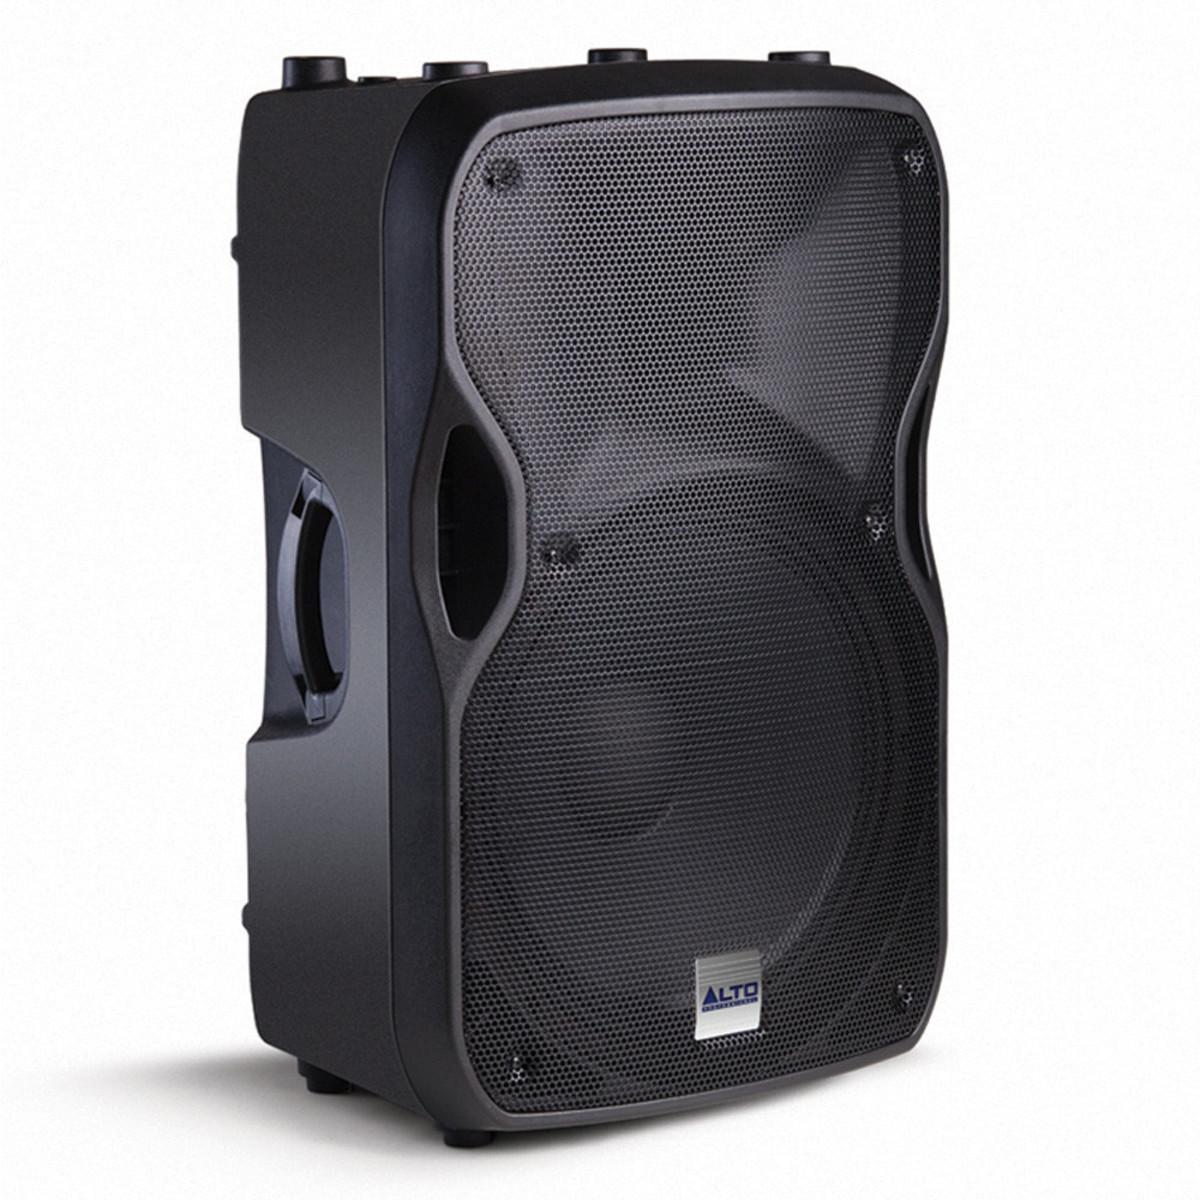 Image of Alto Truesonic TS115 15 Passive PA Speaker